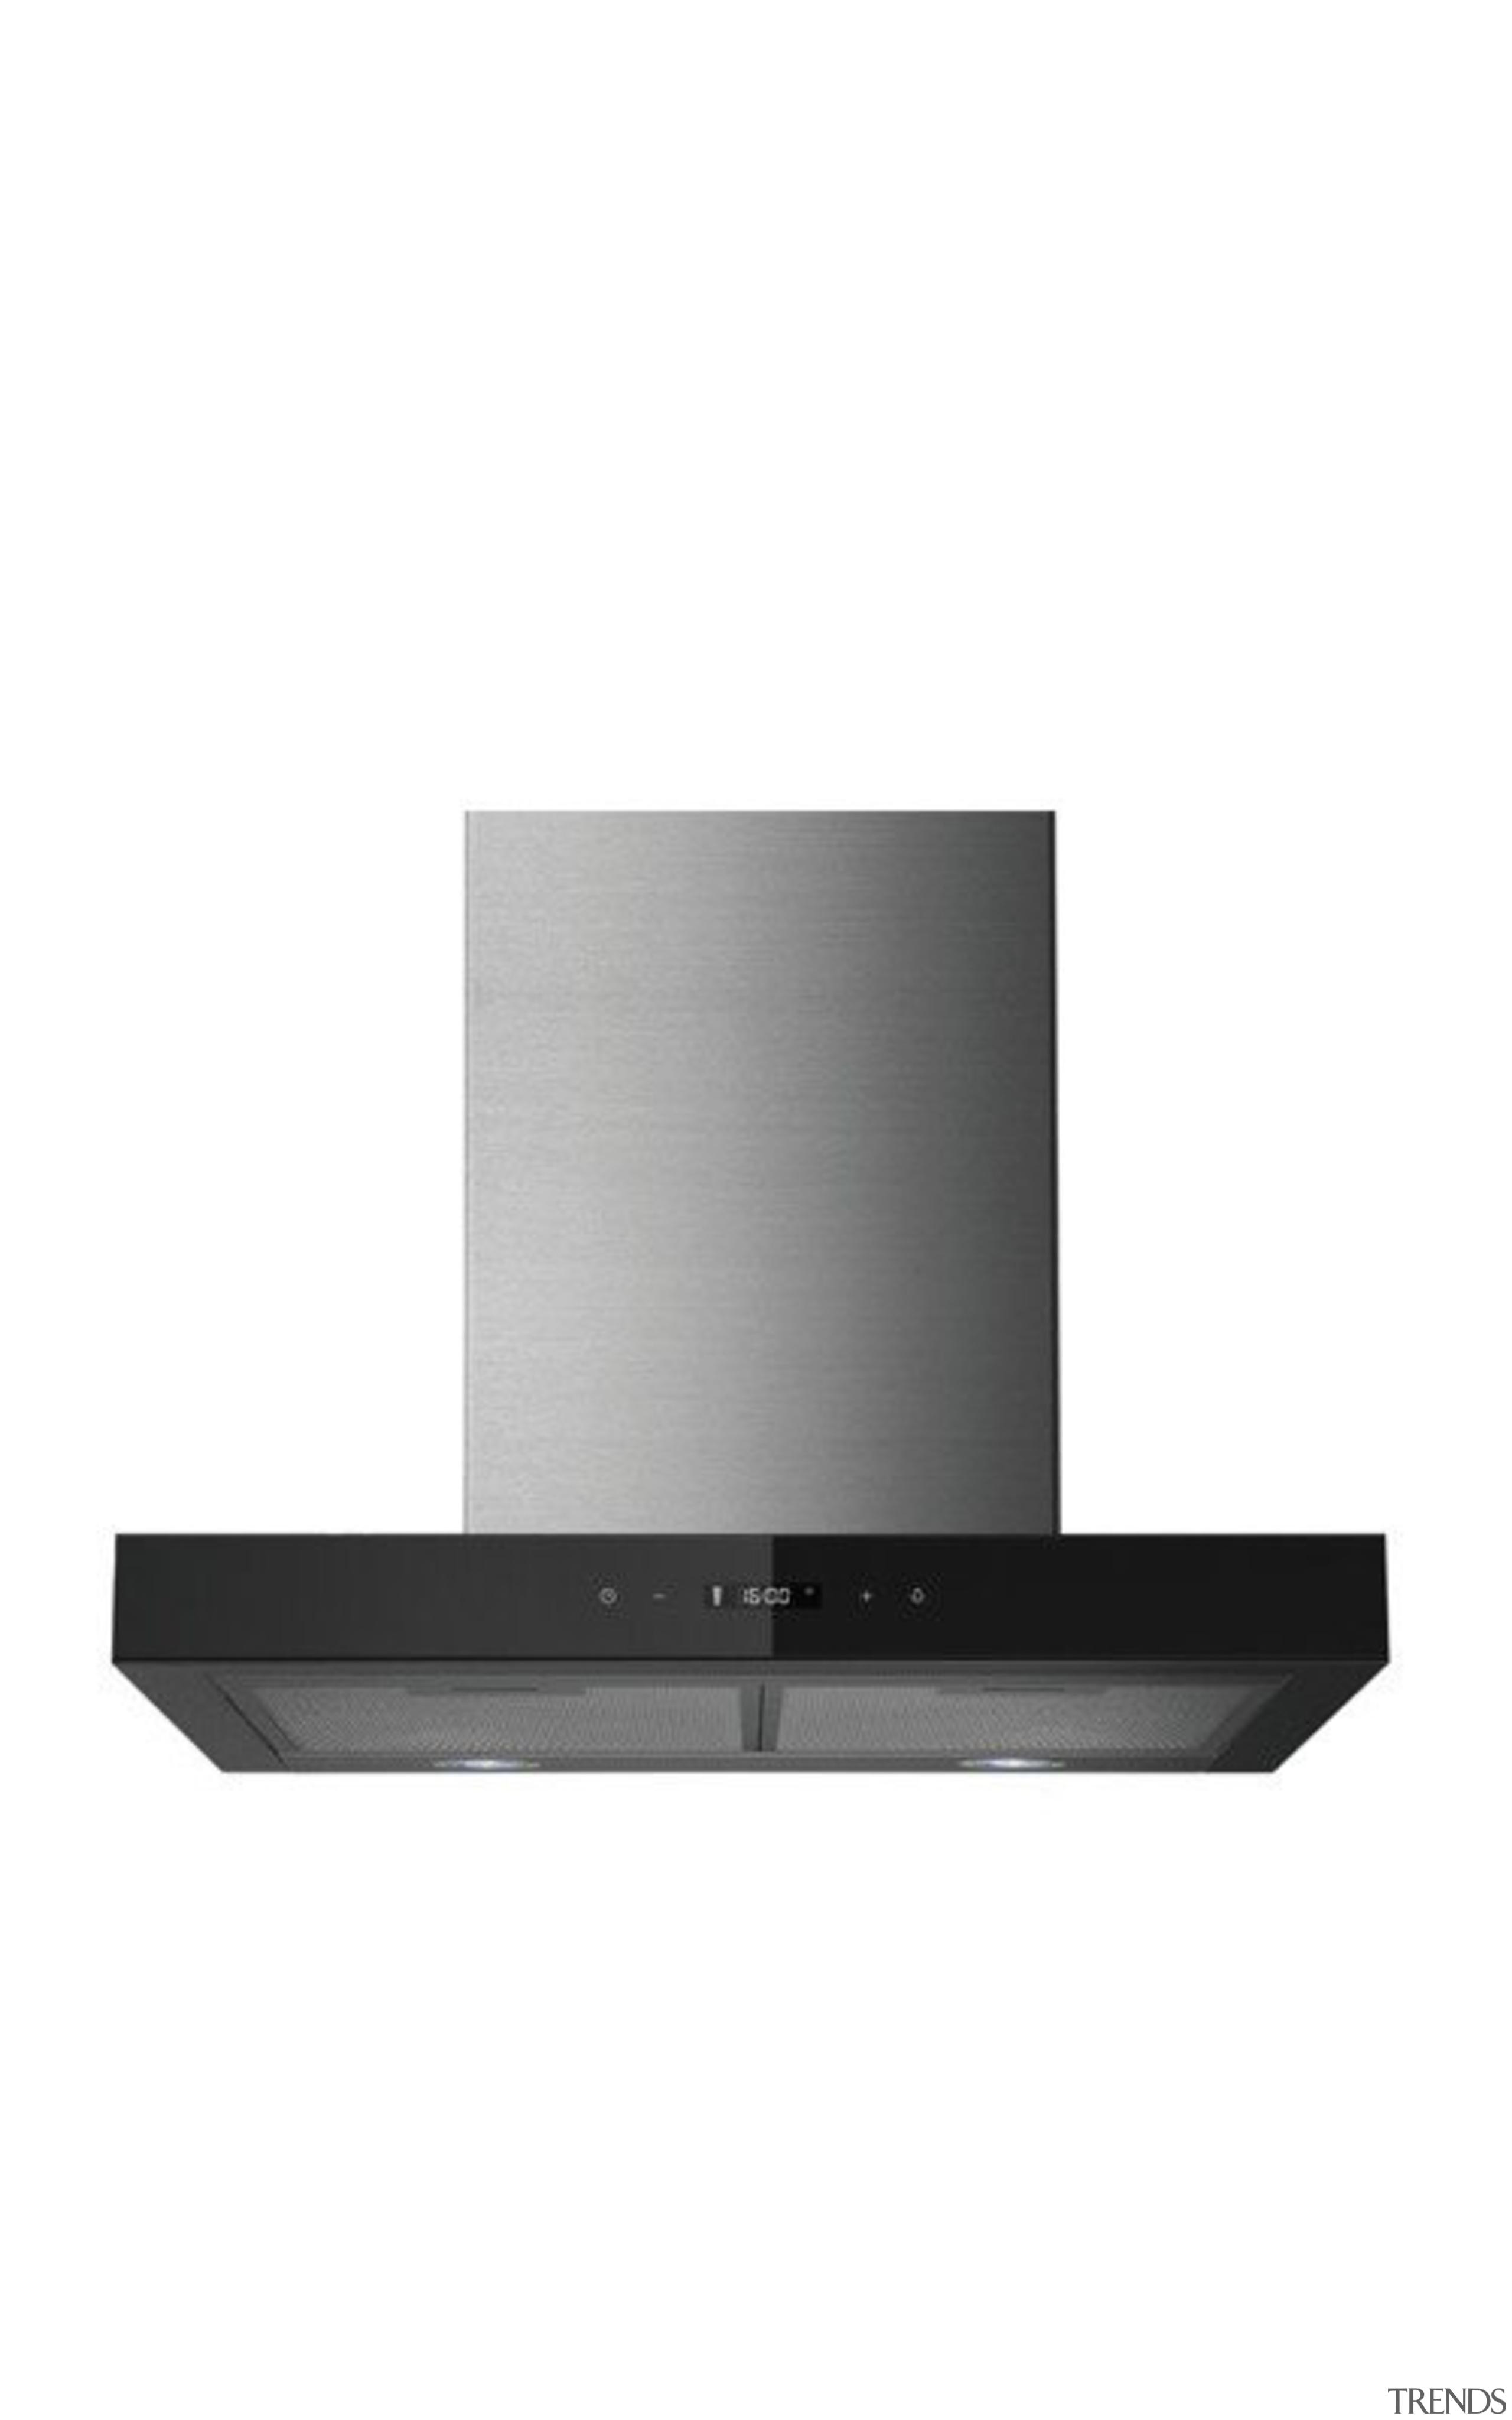 60cm T-Shape RangehoodGlass + stainless steel, Touch control, kitchen appliance, white